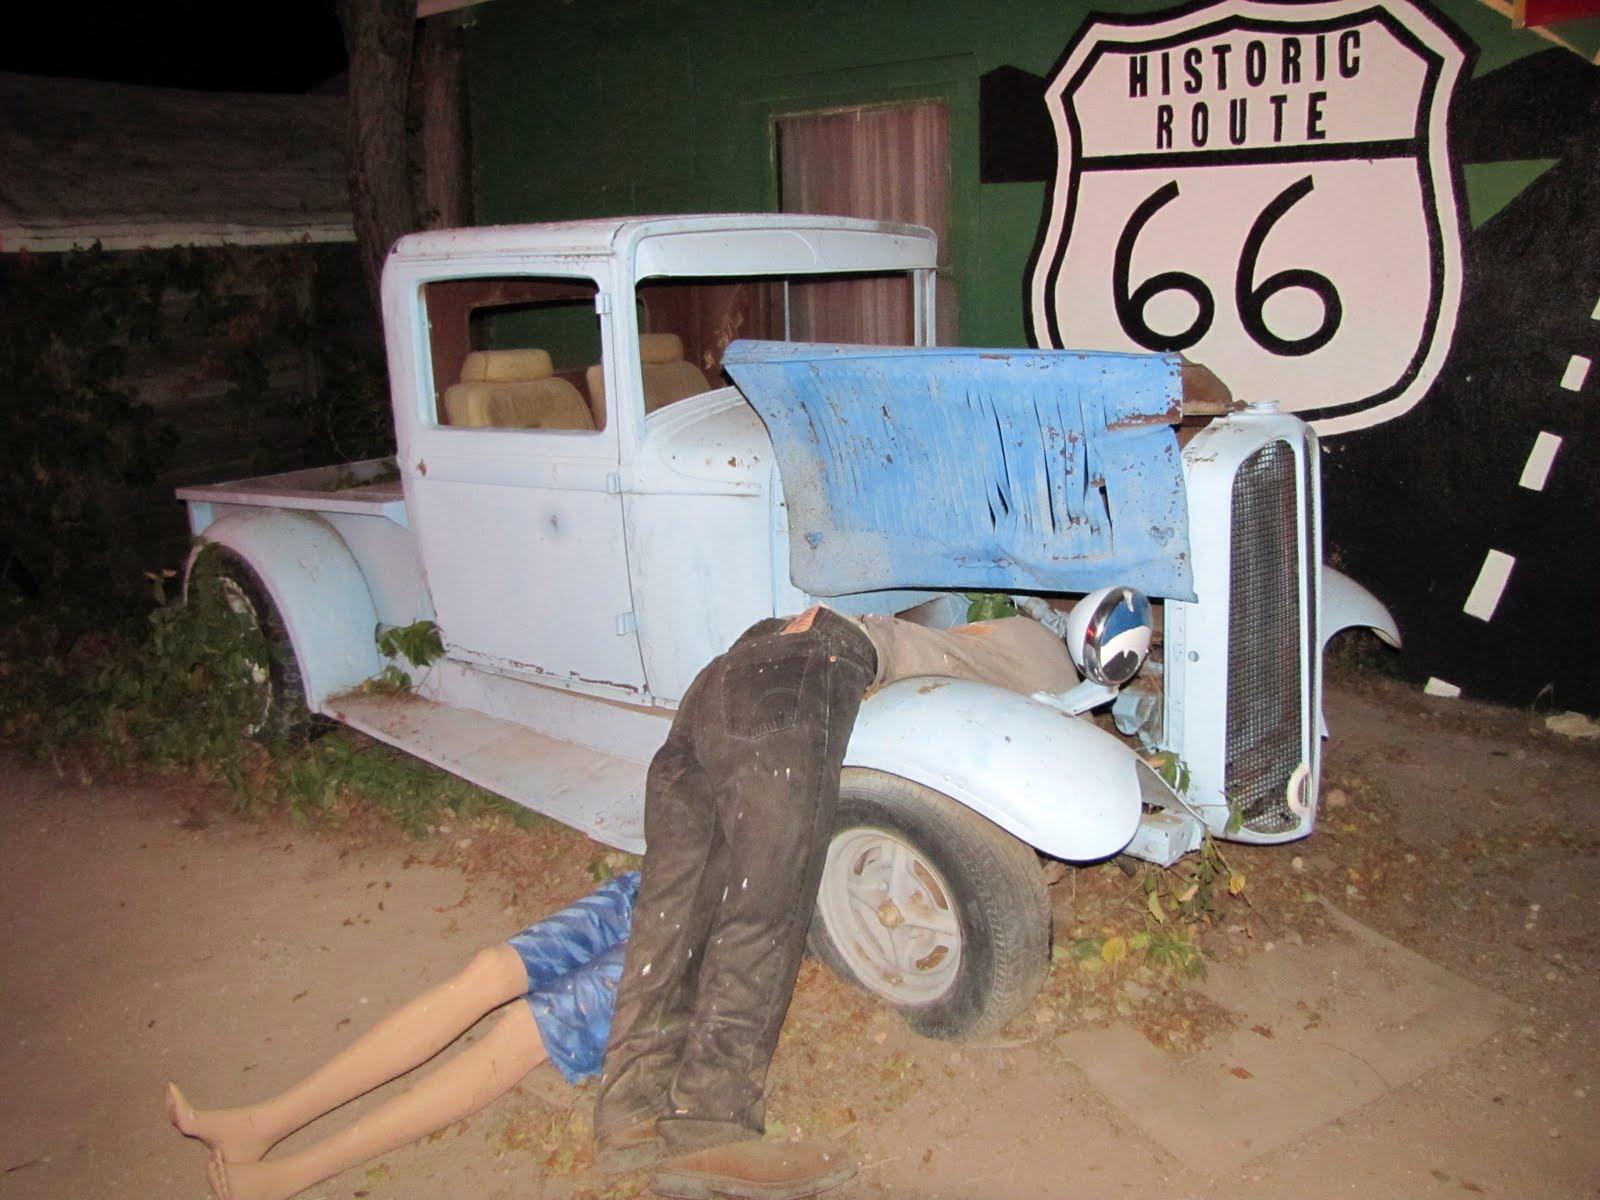 Route 66, Arizona, 1933 Chevrolet Series CB Pickup